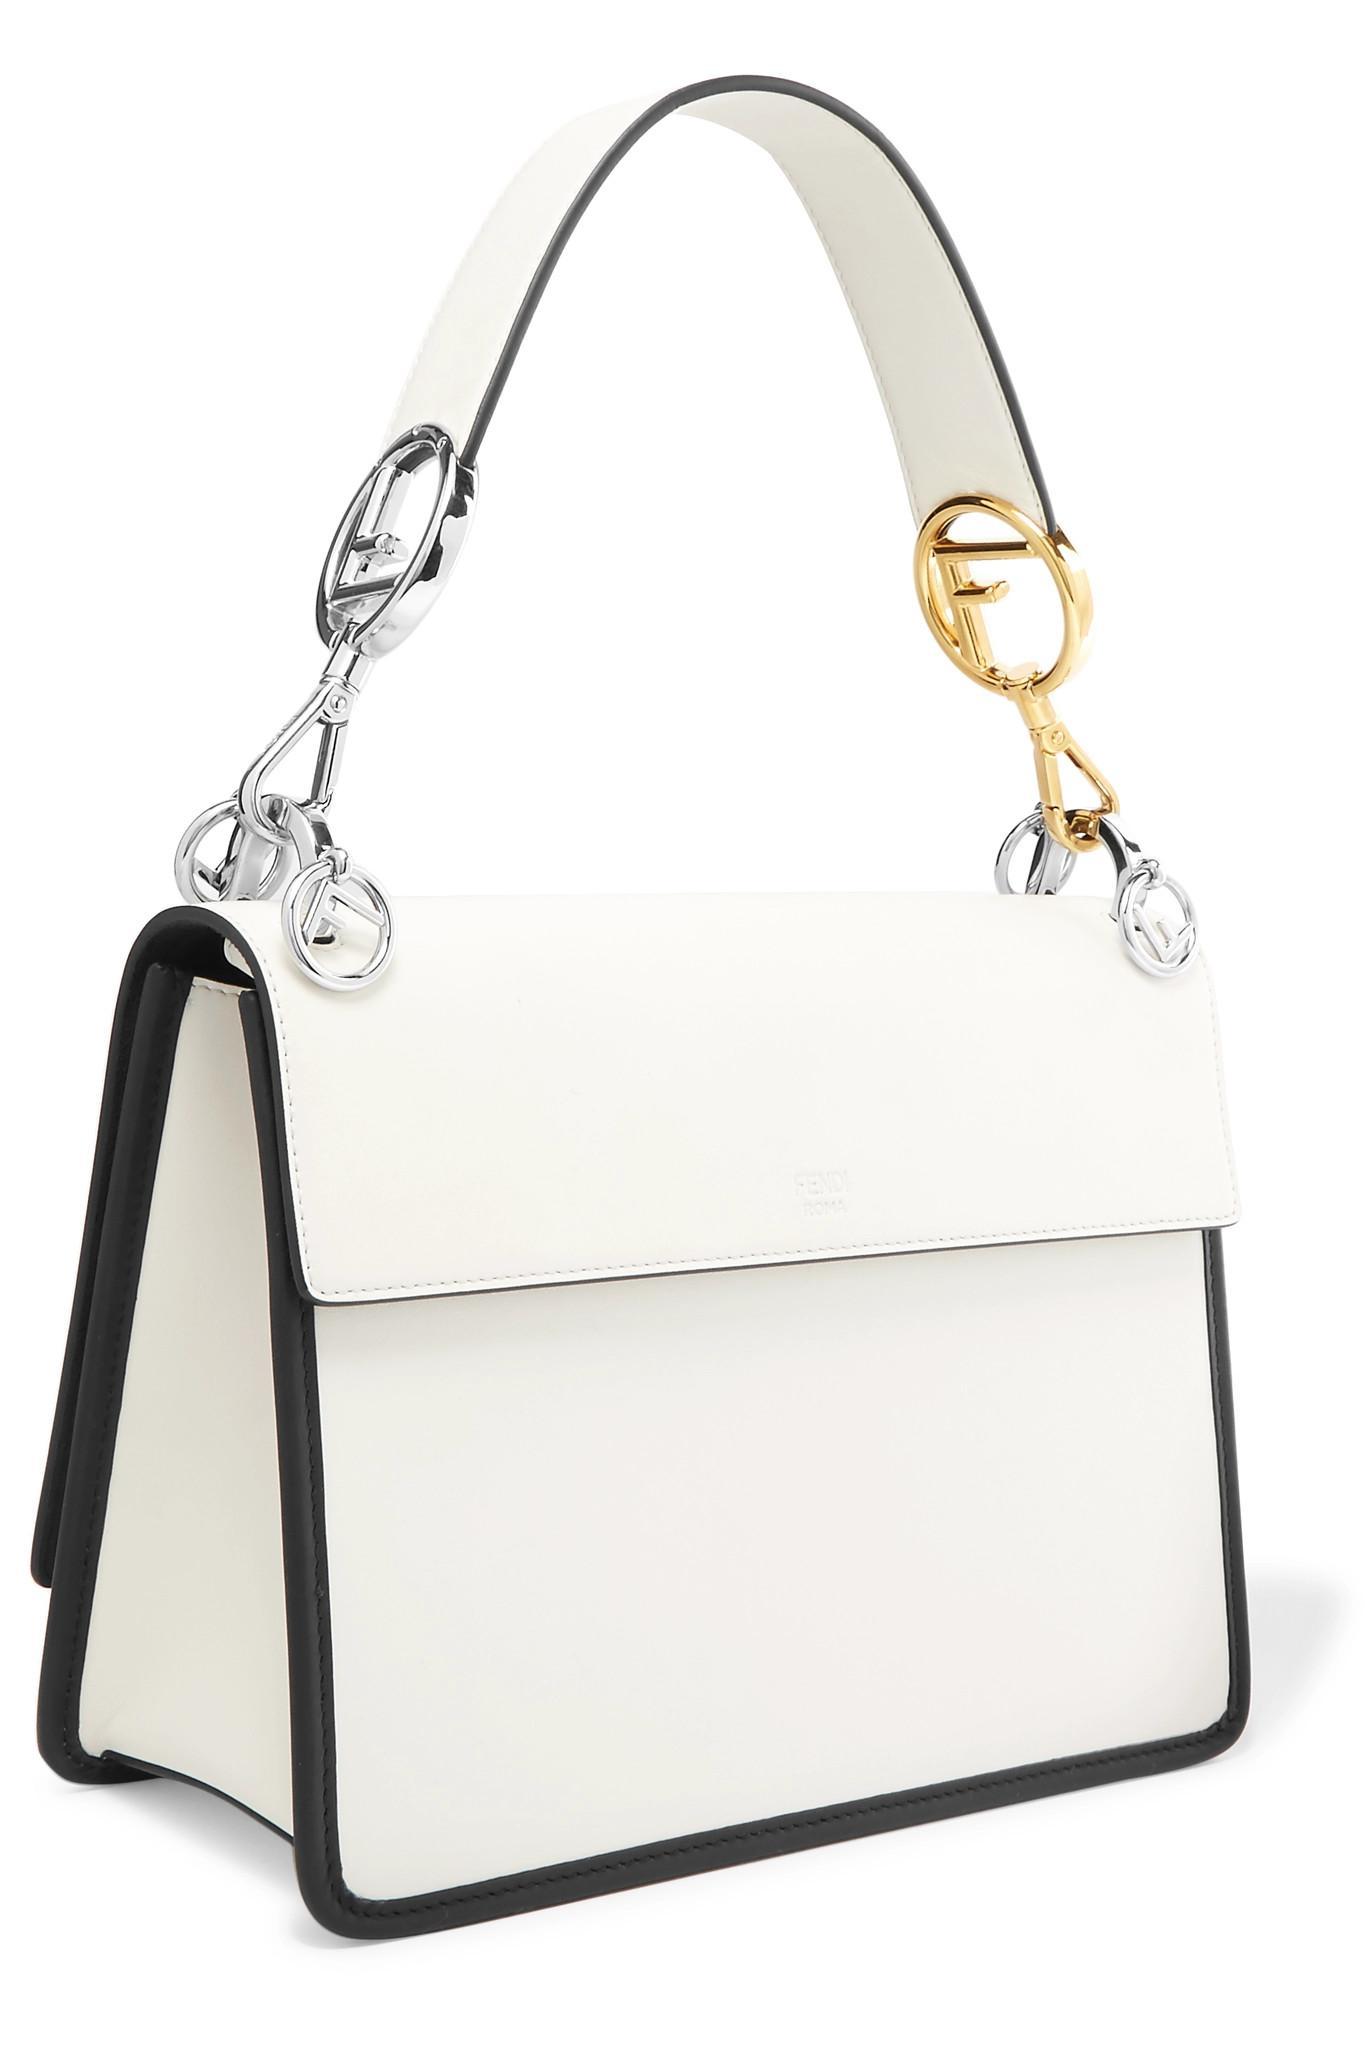 Fendi - White Kan I Leather Shoulder Bag - Lyst. View fullscreen 28877bfdd47a7